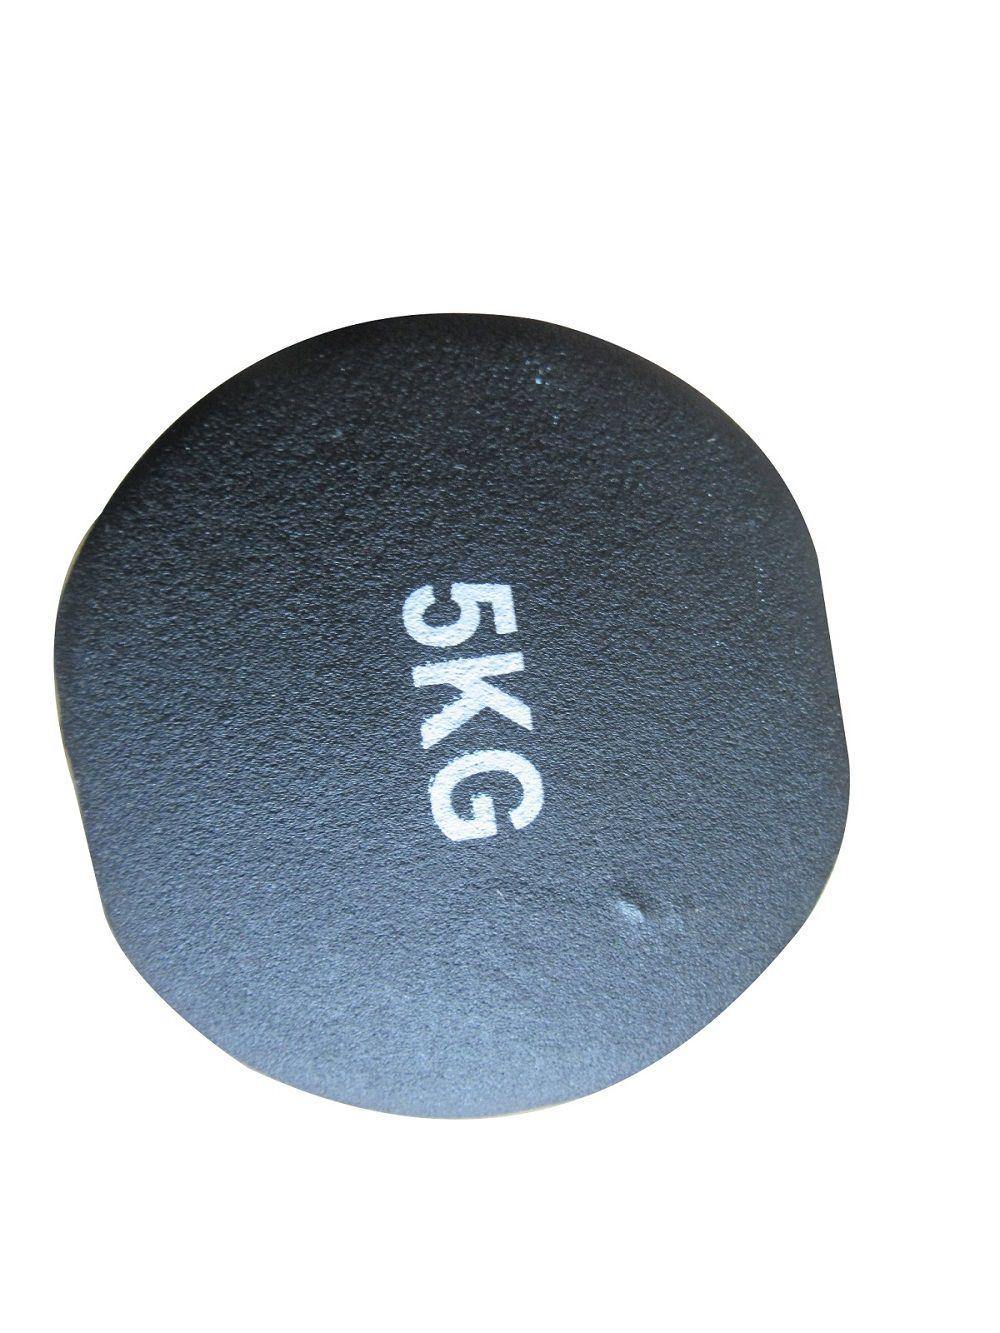 Kit 2 Halteres em Ferro Fundido Revestido com Neoprene Pelegrin  PEL-05DB 5kg - Preto